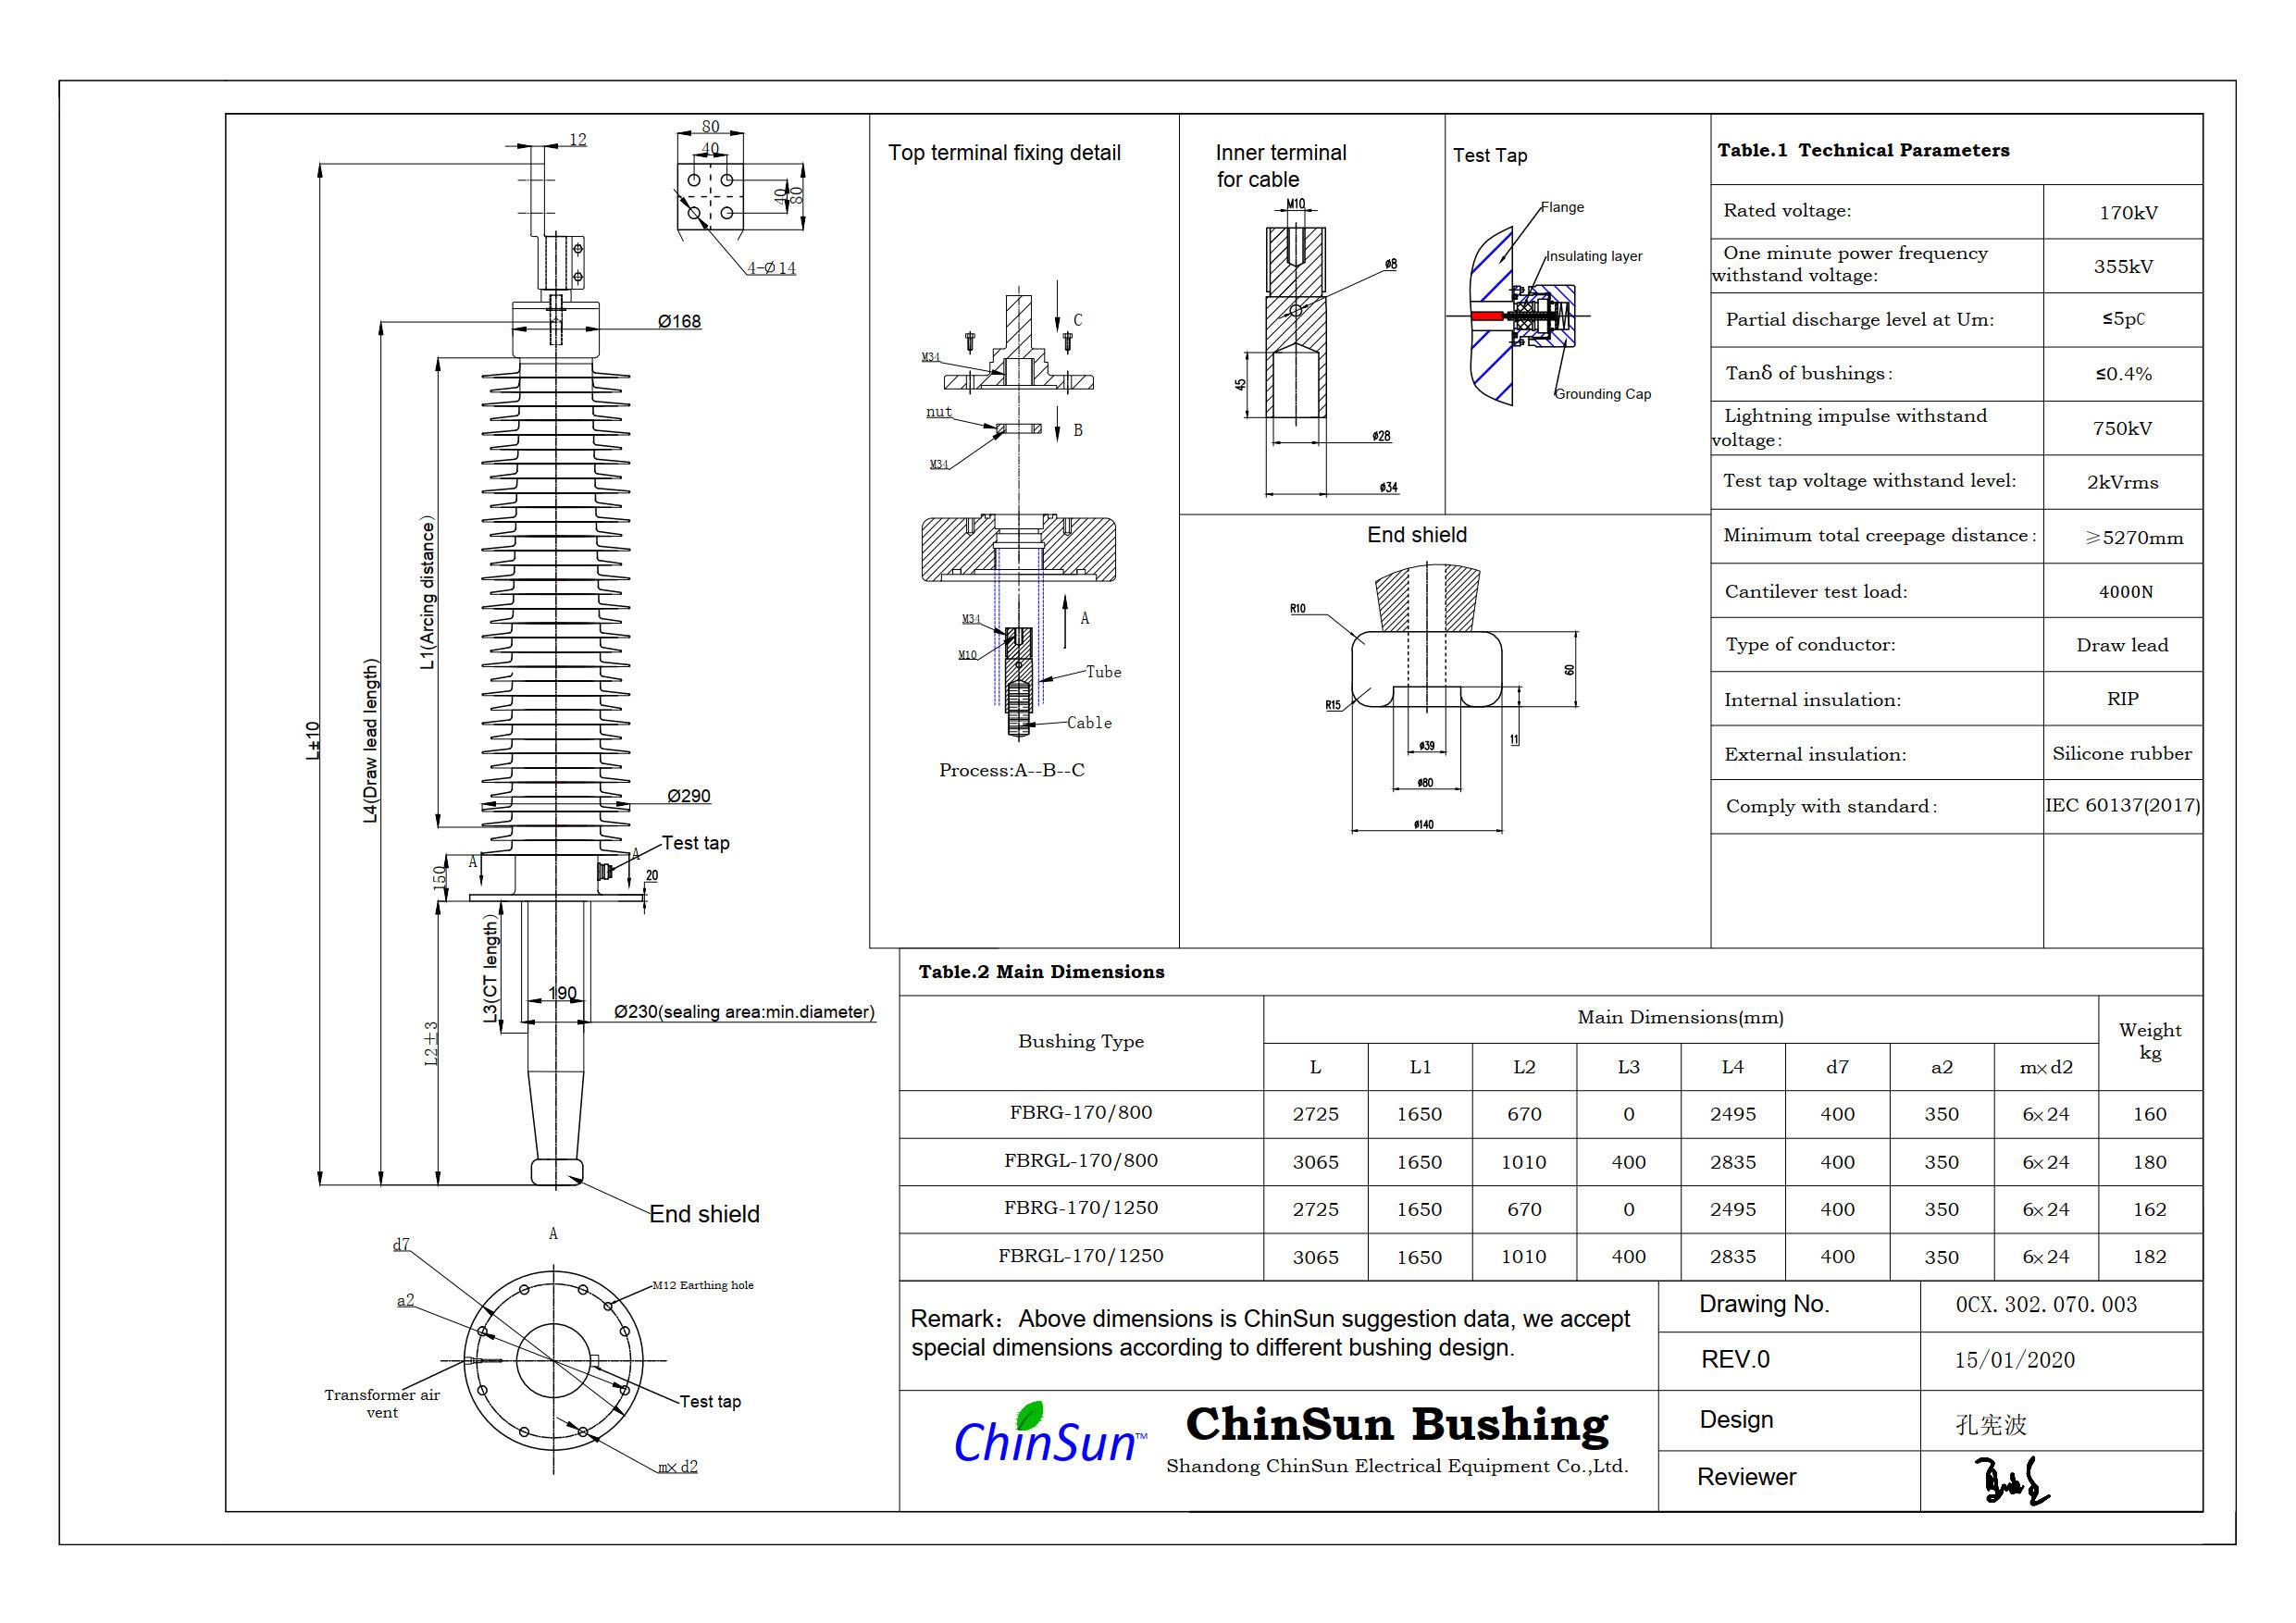 Drawing-transformer bushing-170kV_silicone rubber-DL-ChinSun